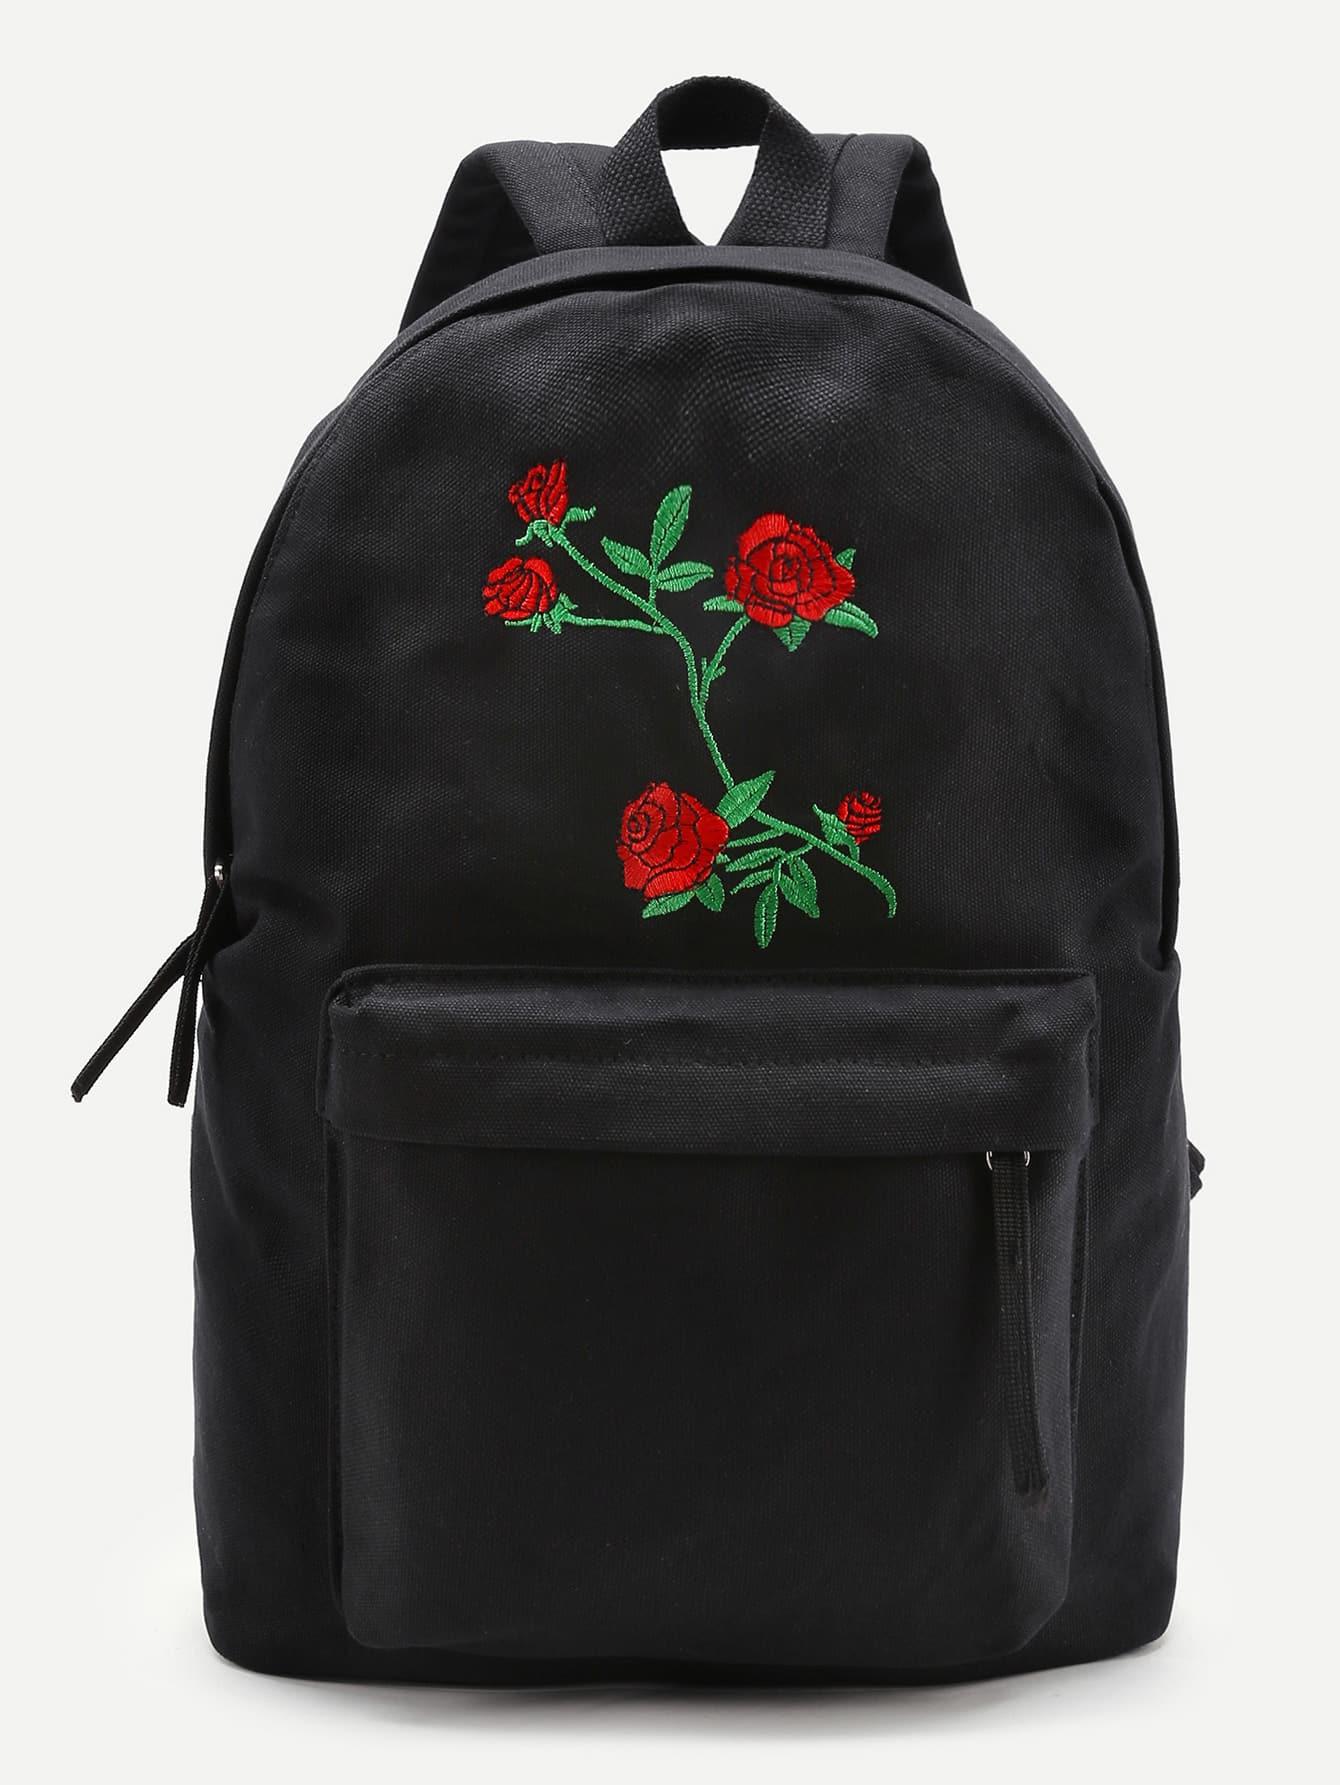 bag170512314_1